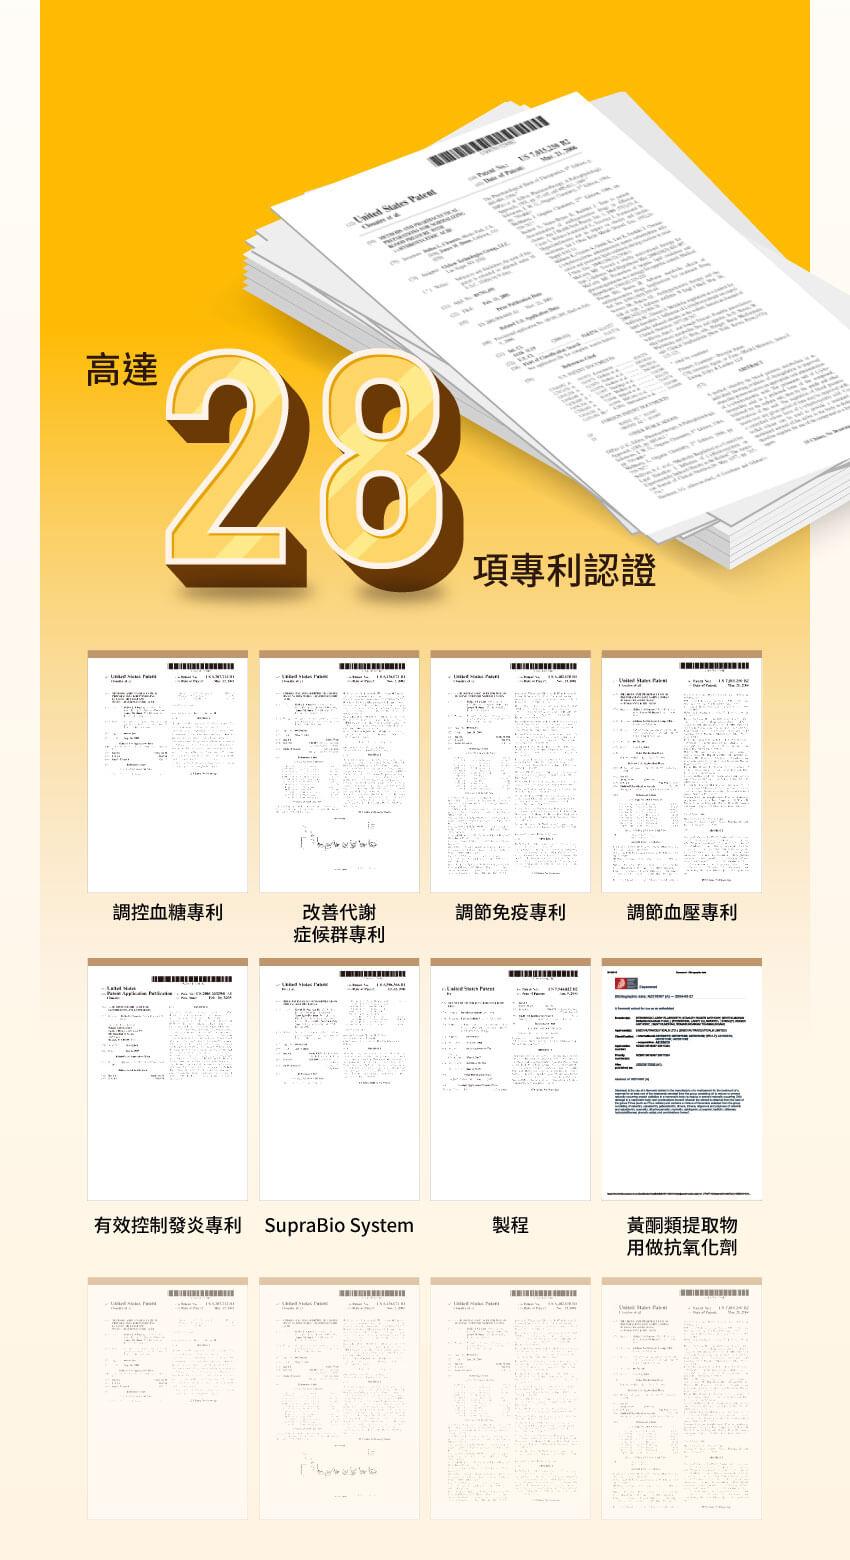 SBH高達28項專利認證